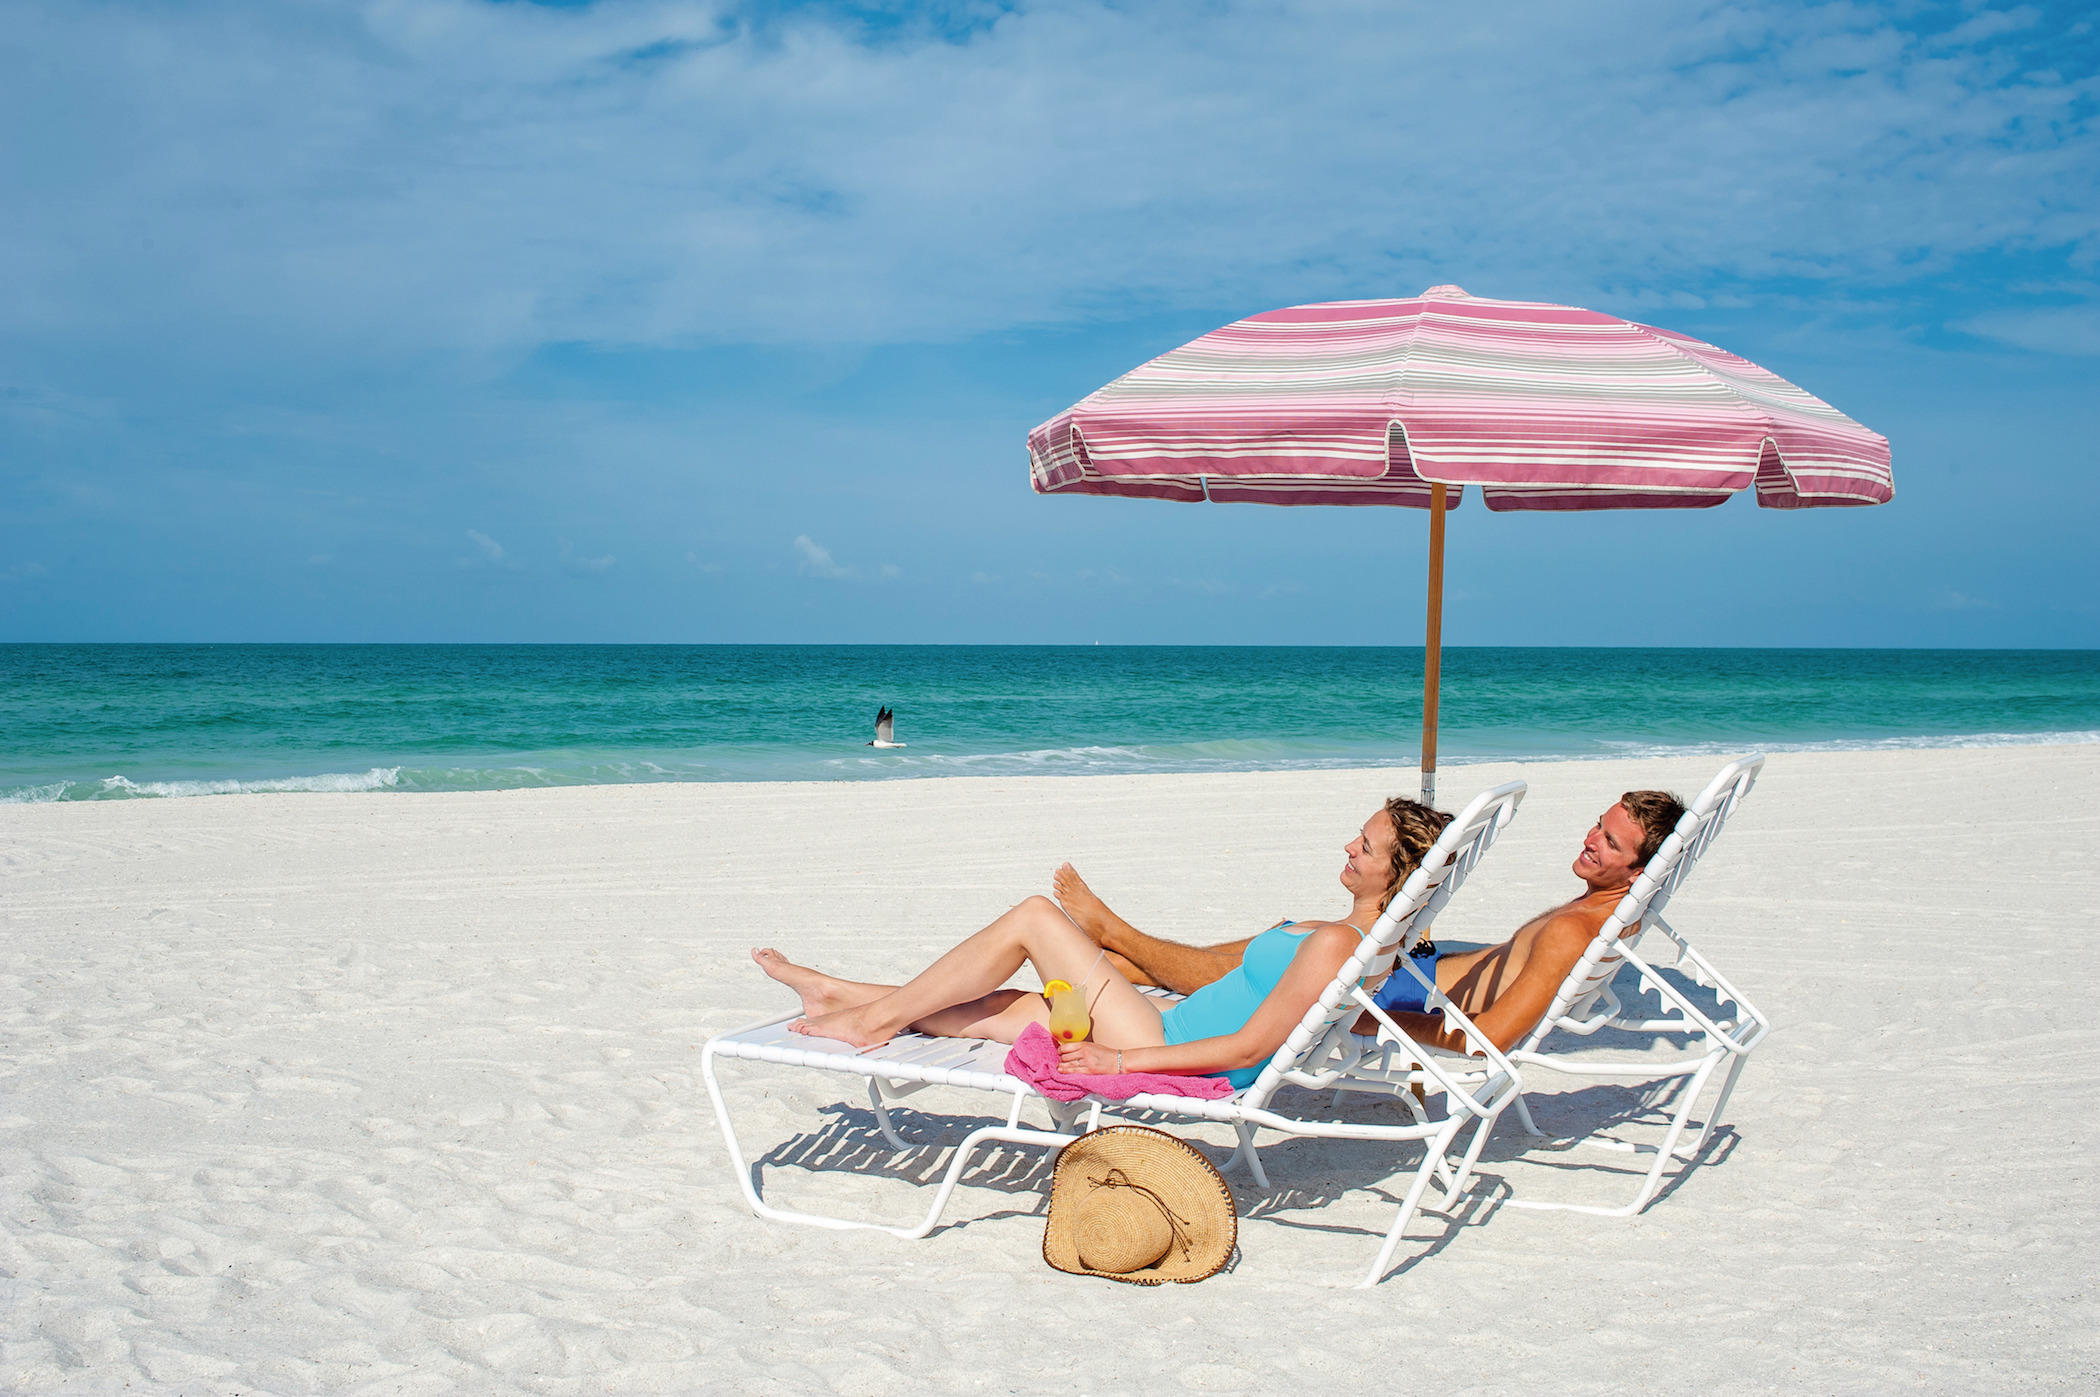 Sandcastle Resort at Lido Beach image 11